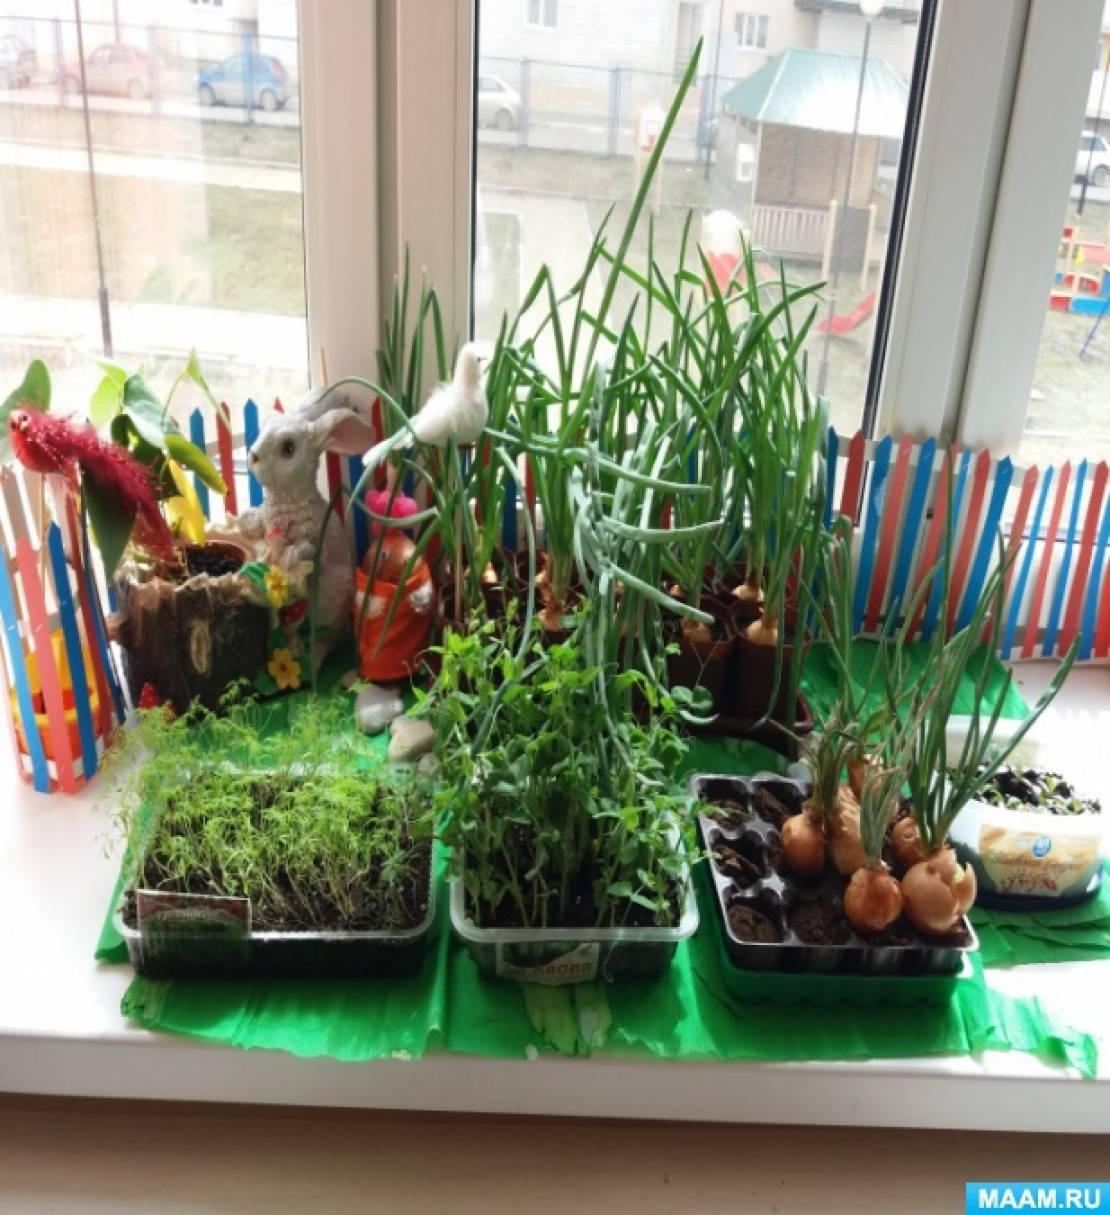 Фотоотчет «Что за чудо-огород на окошке растет»